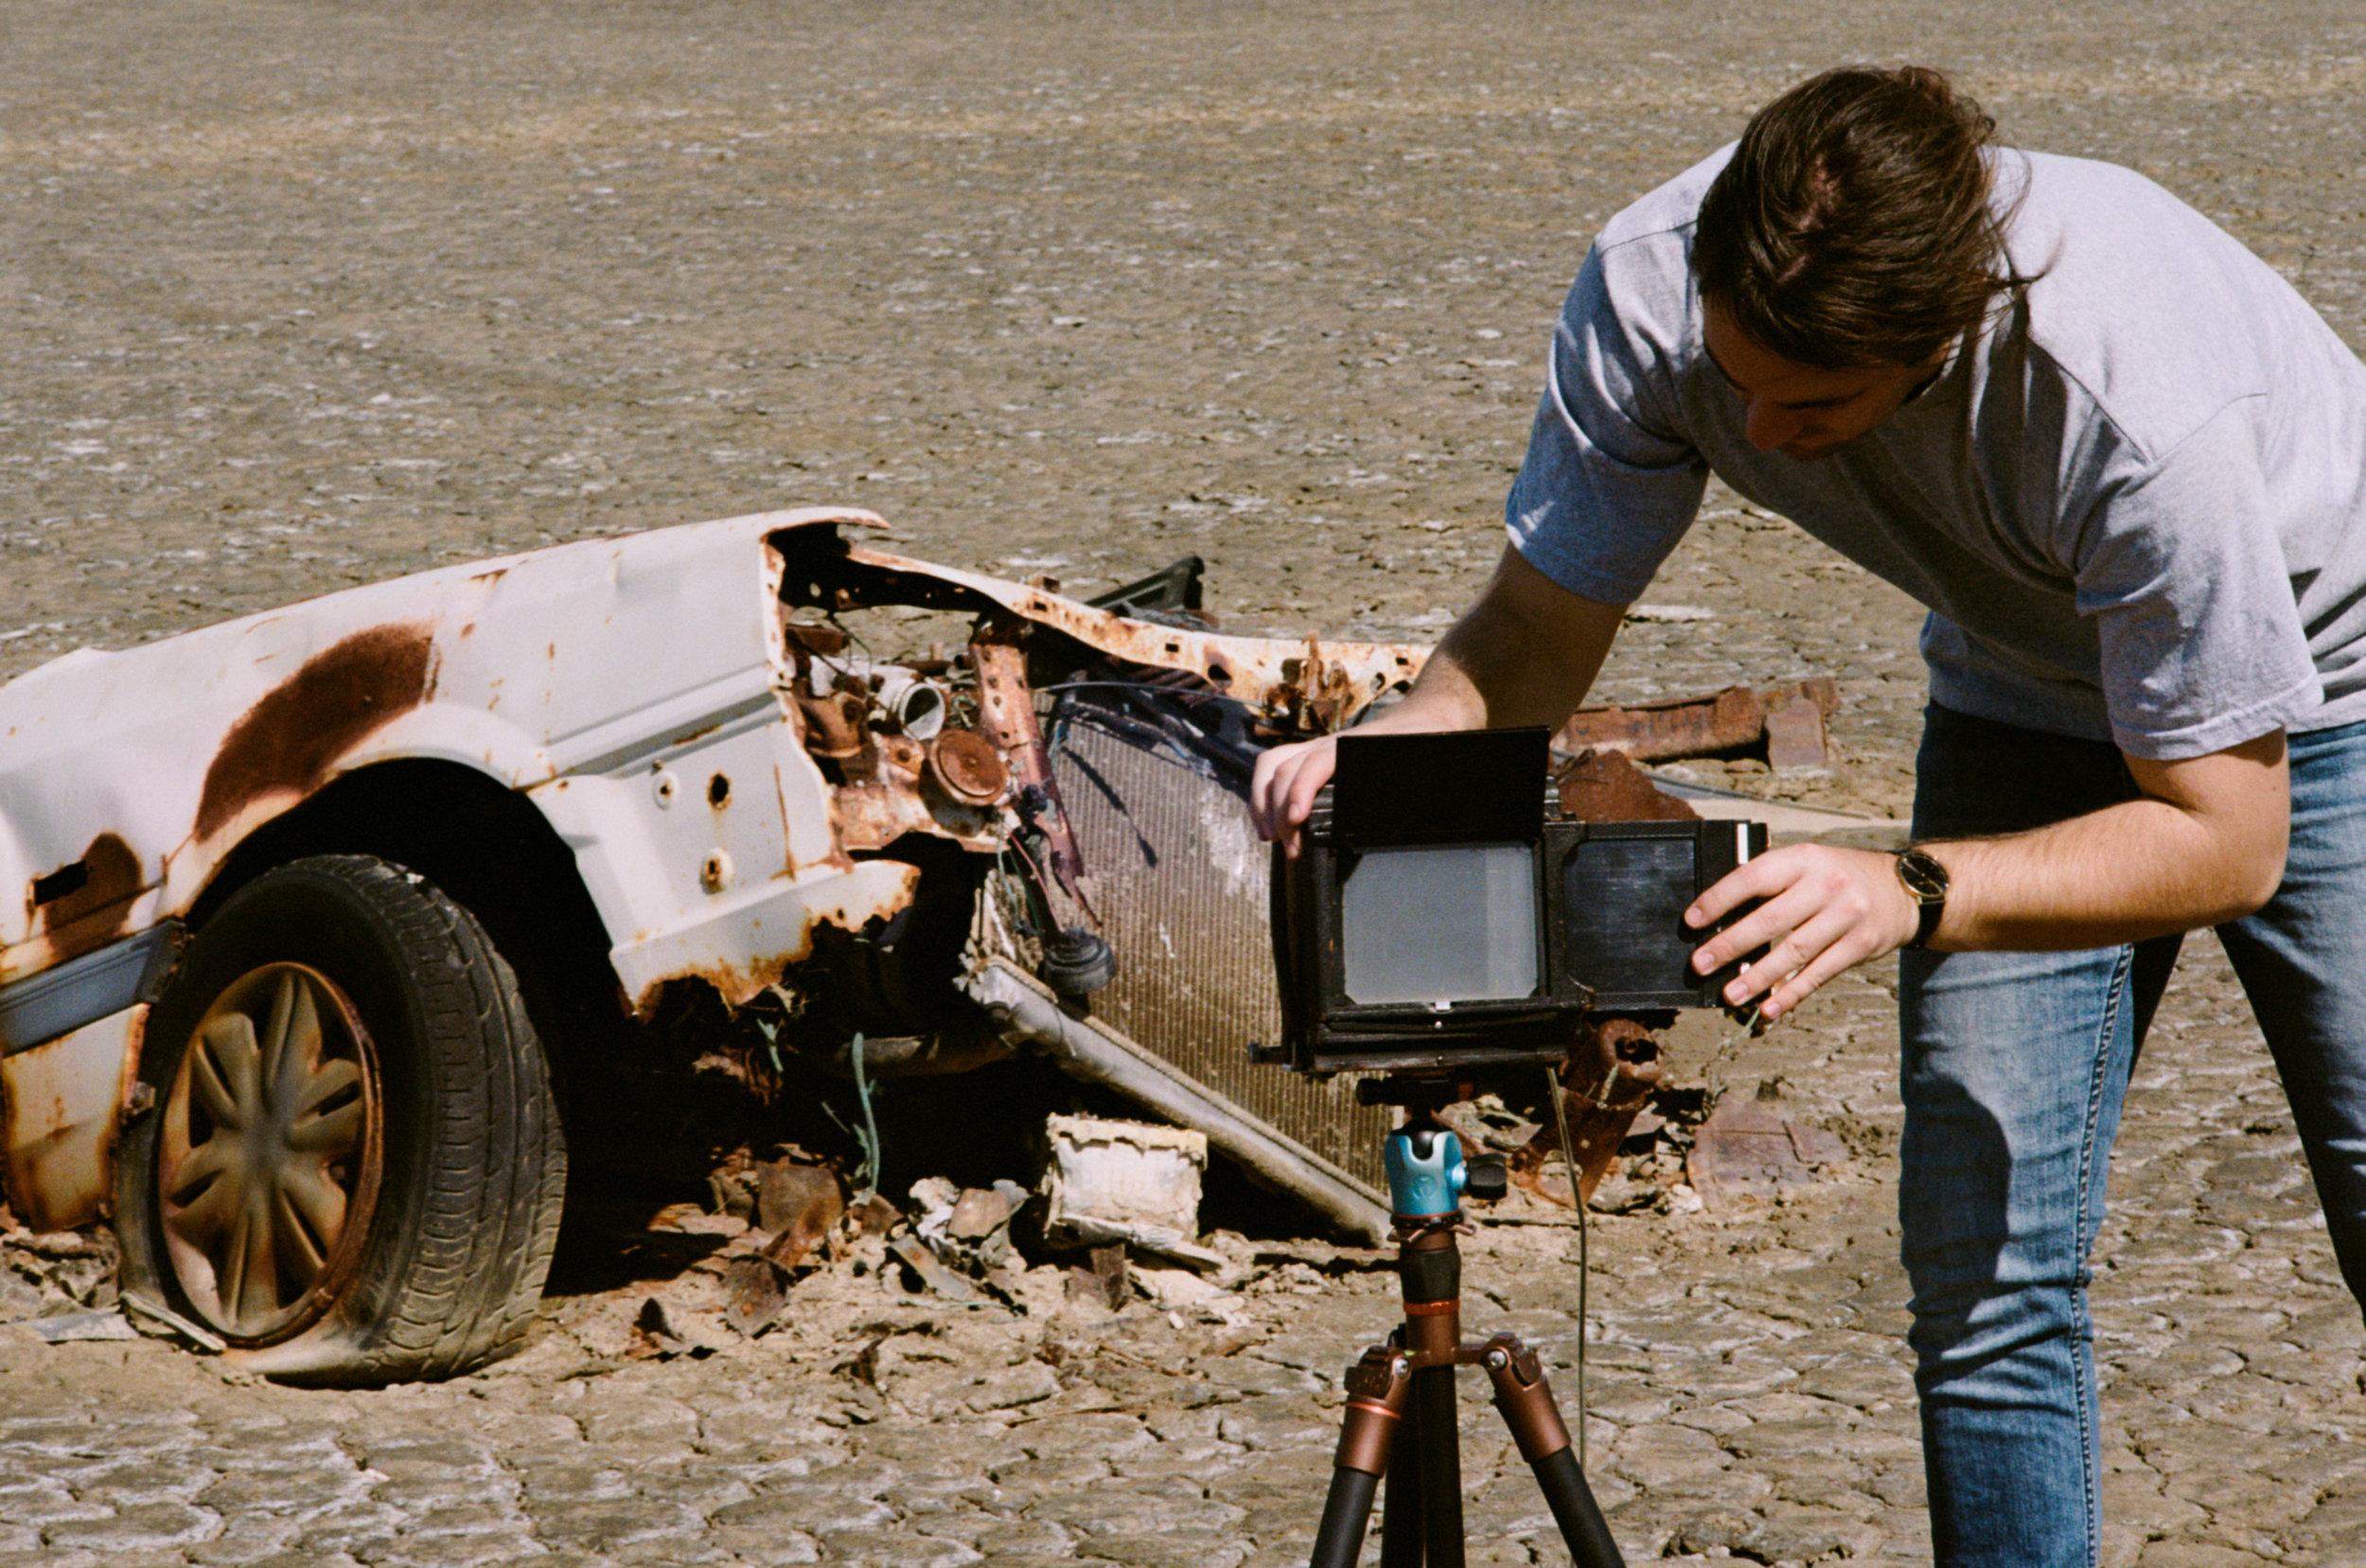 Elijah loading the holder into the camera for the shot below. Kodak Portra 400, Nikon F w/ 105mm f2.5 non-ai.